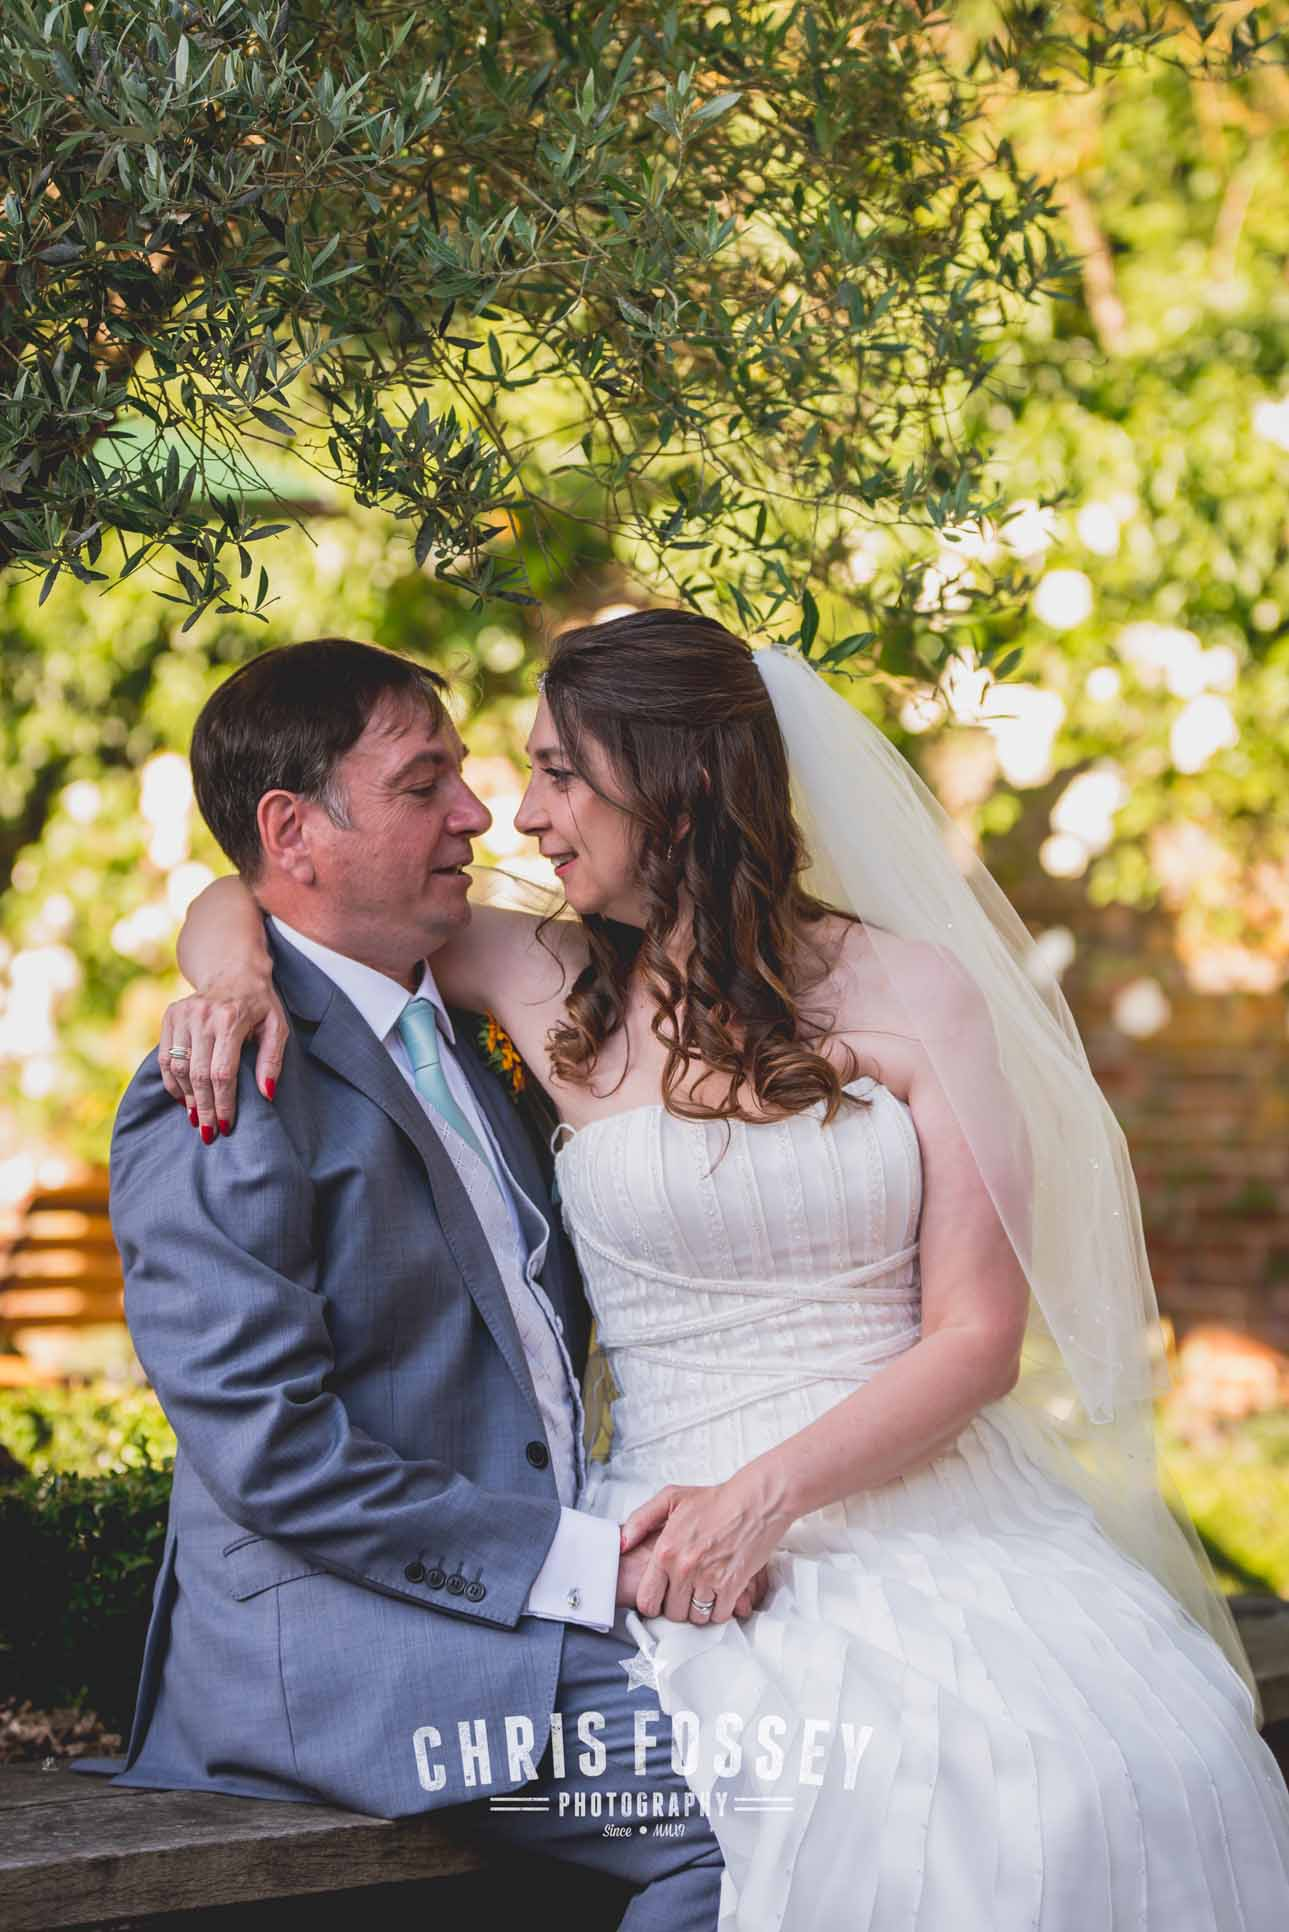 Shustoke-barn-wedding-photography-chris-fossey-warwickshire-karen-matt